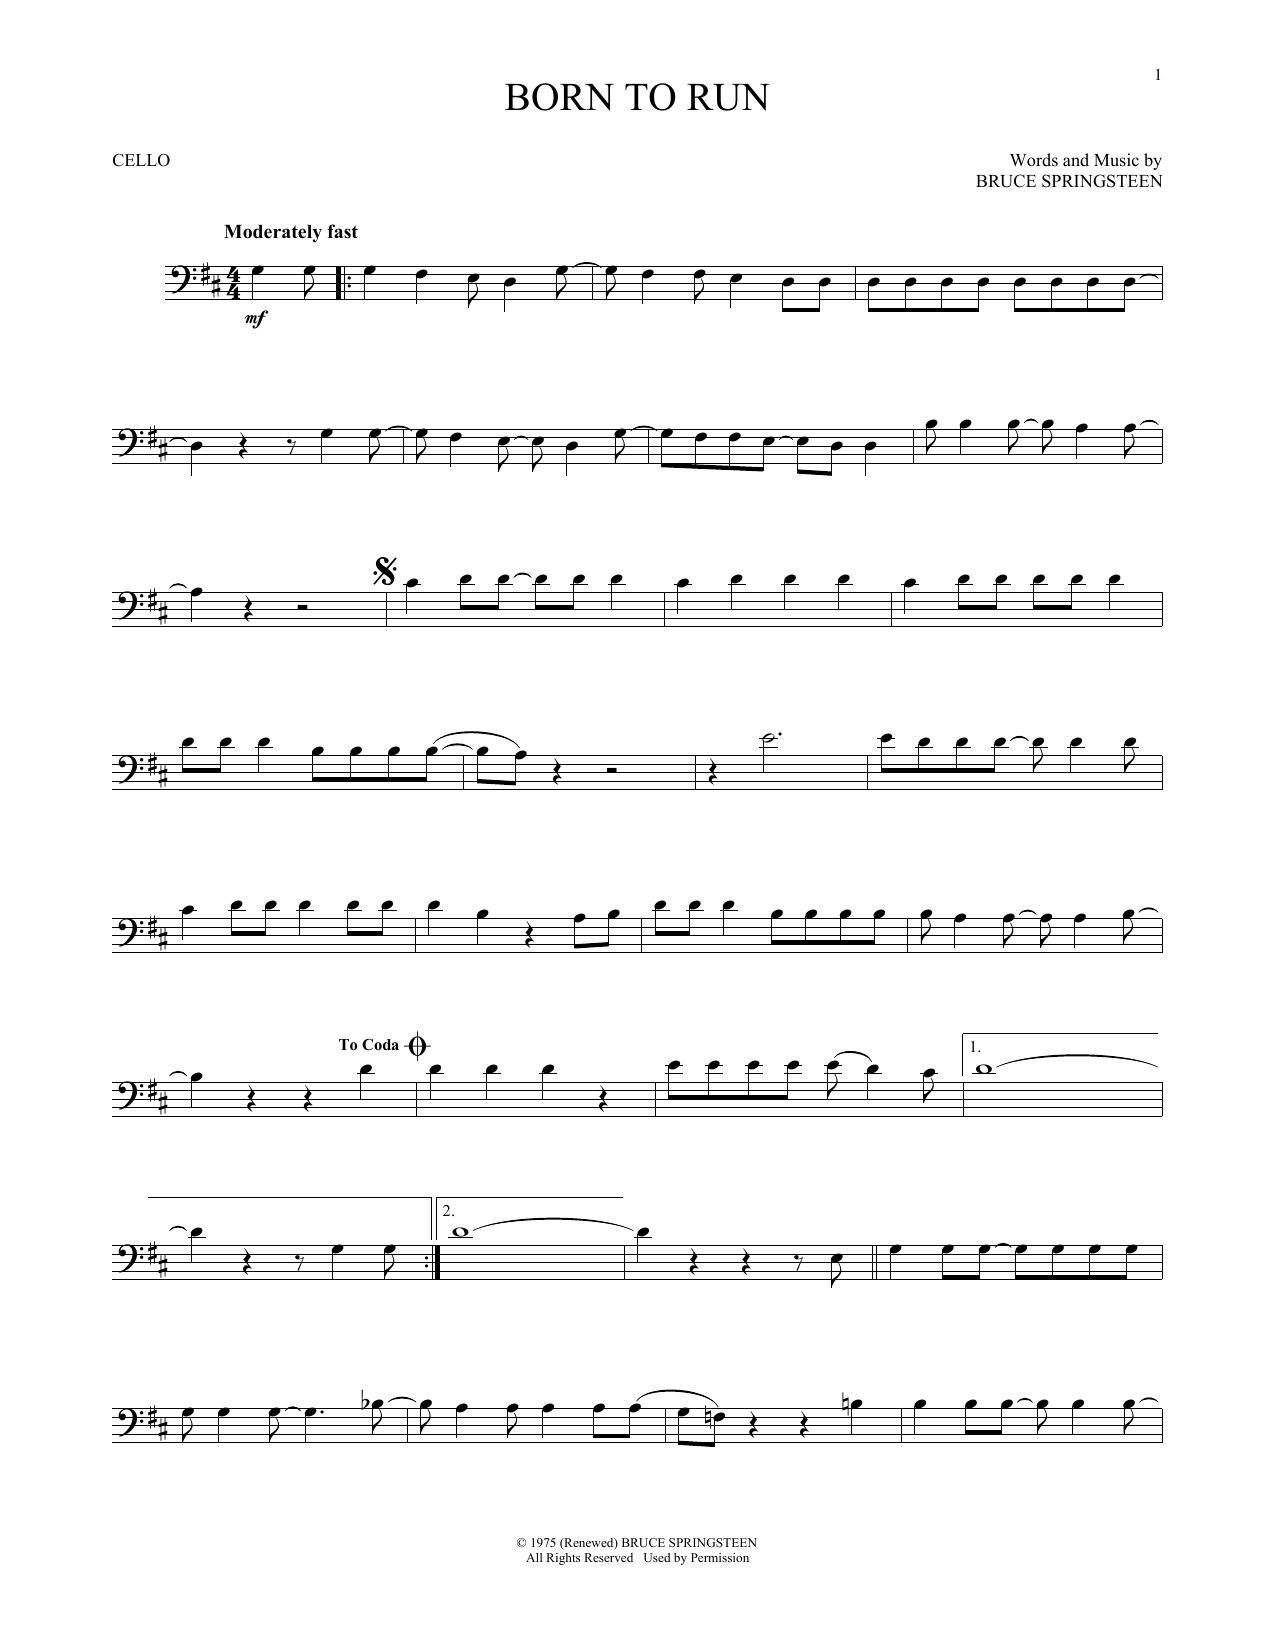 Bruce Springsteen Born To Run Sheet Music Notes Chords